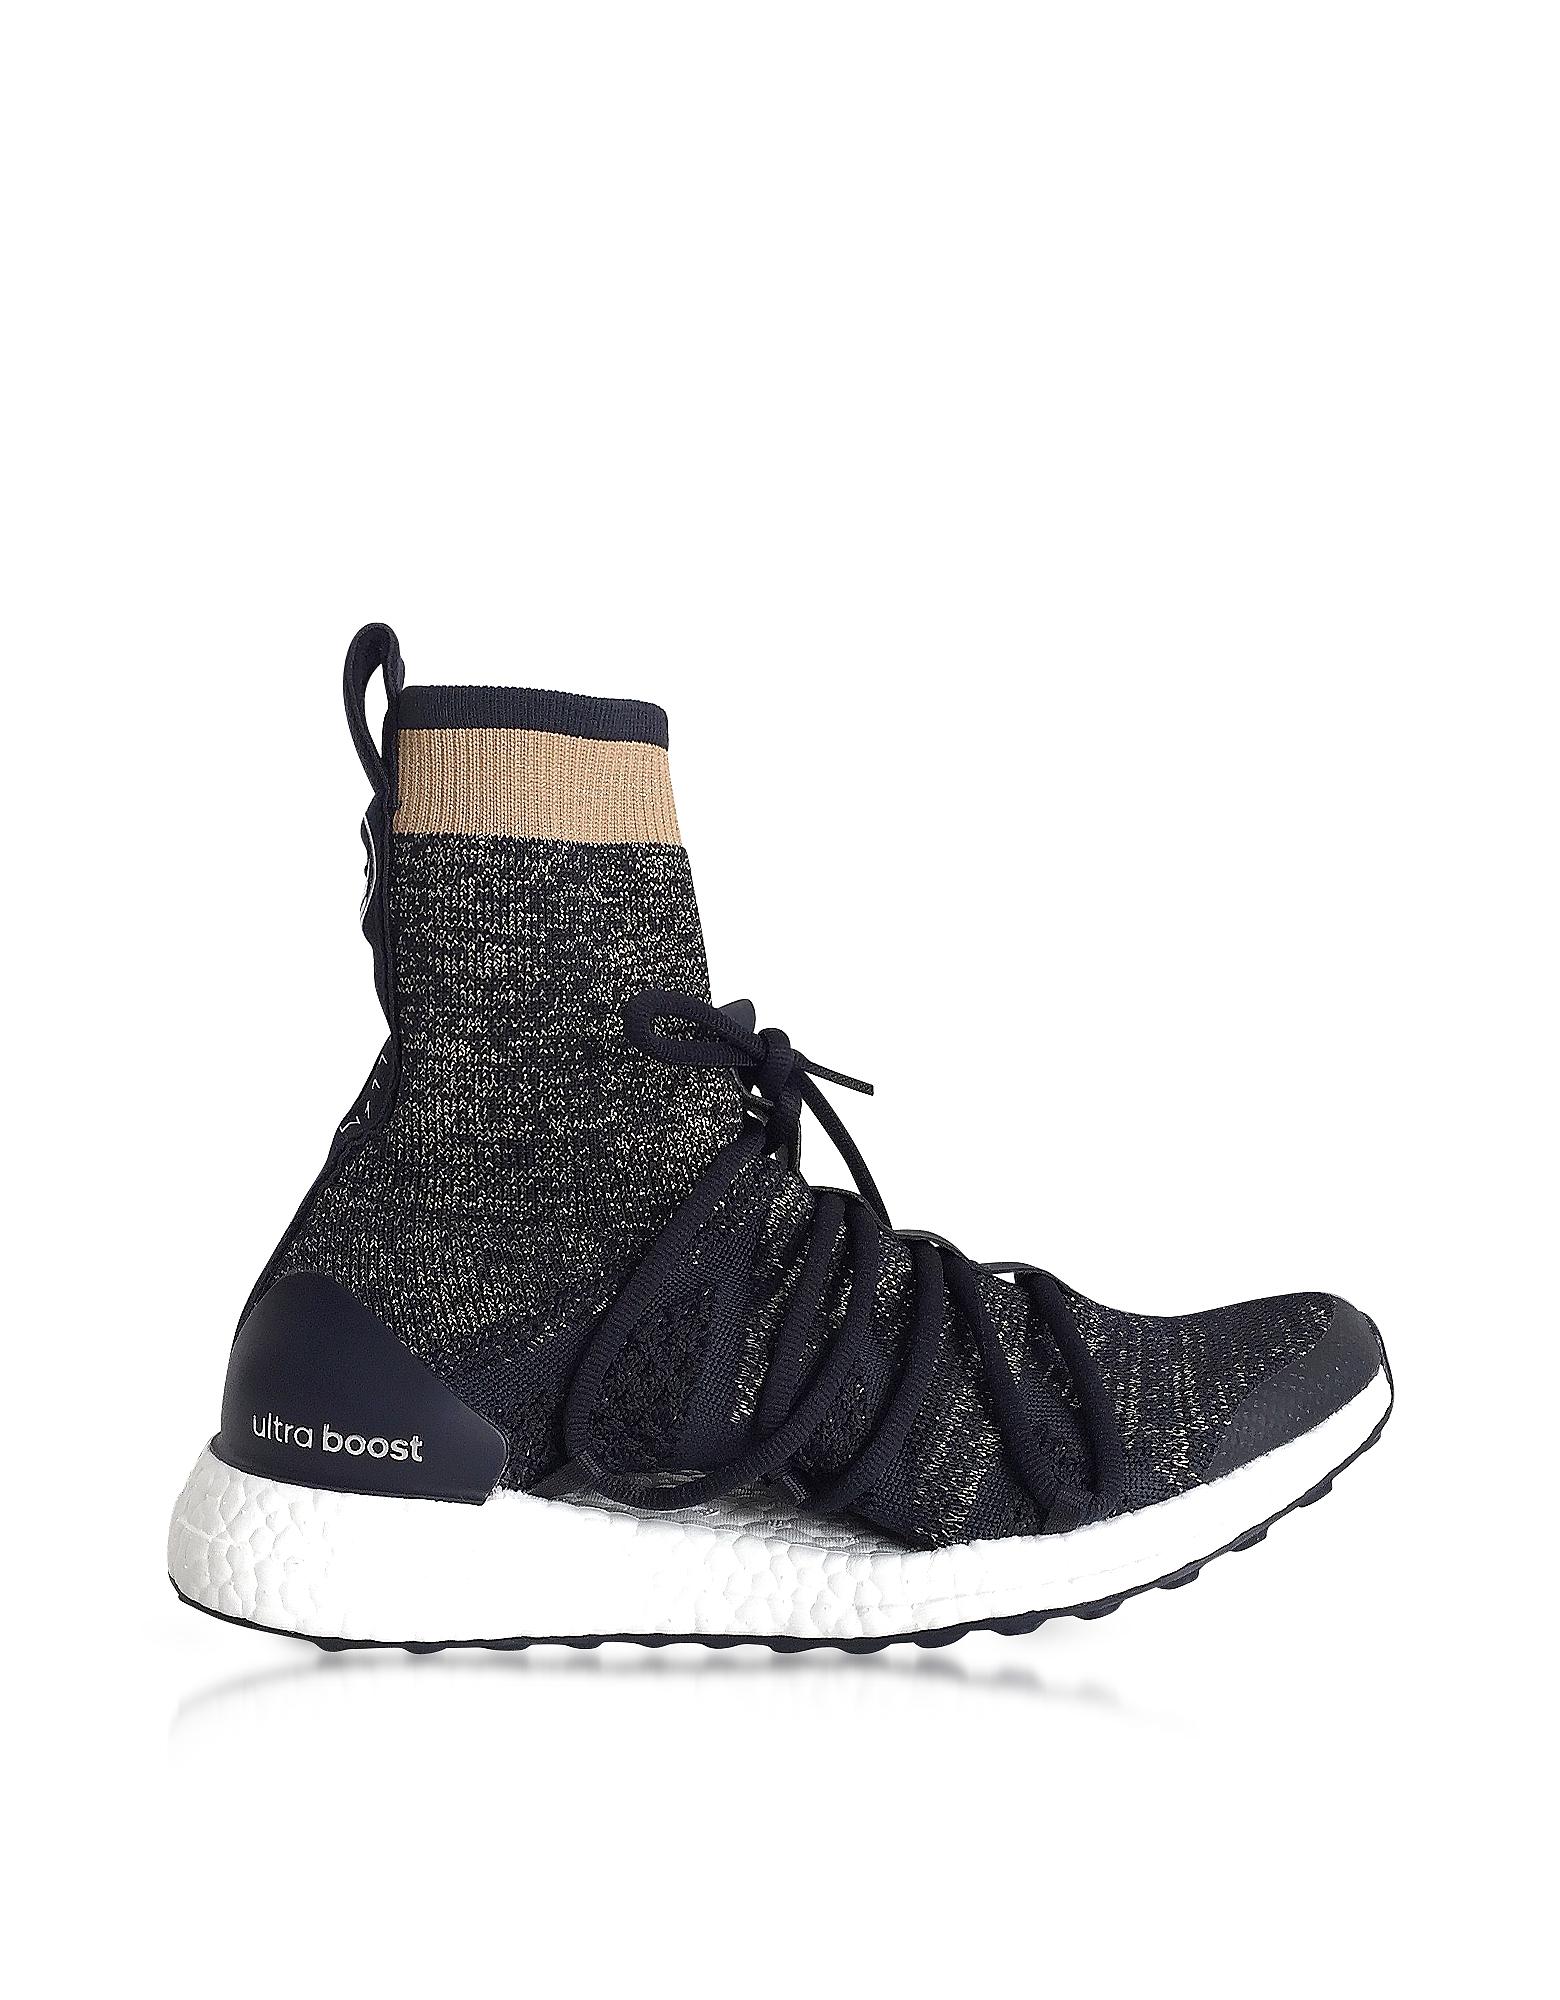 Adidas Stella McCartney Shoes, Legend Blue Ultraboost X Trainers